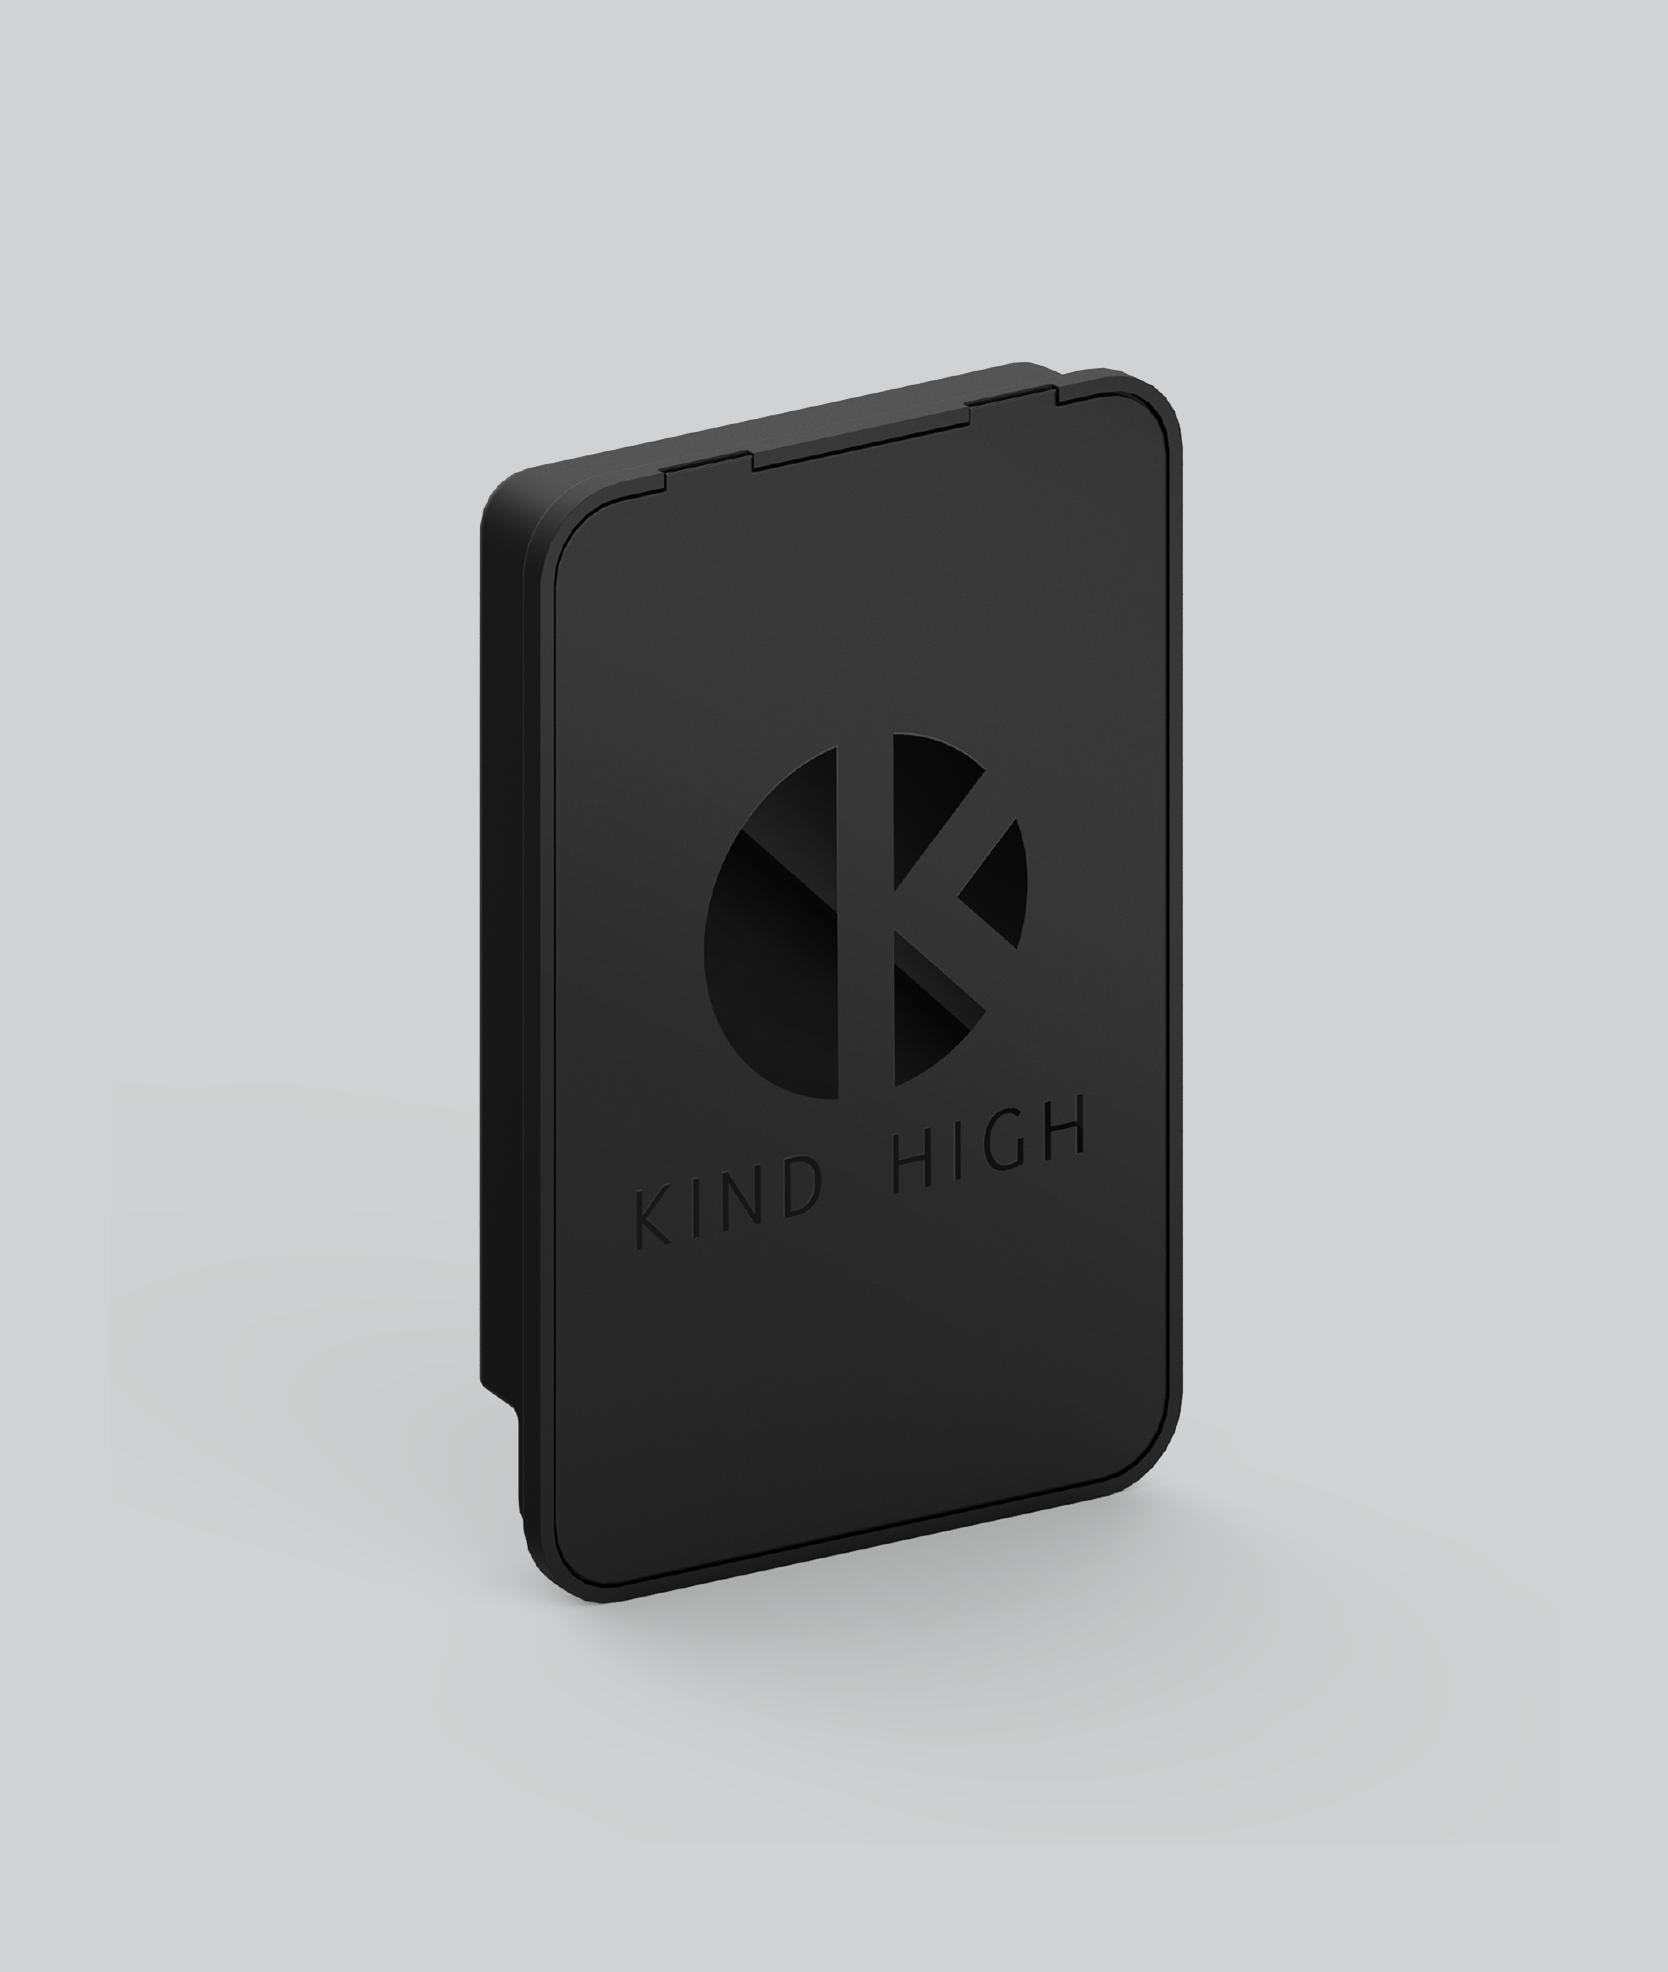 kindhigh-snaptech-case-cbd-pre-roll-case